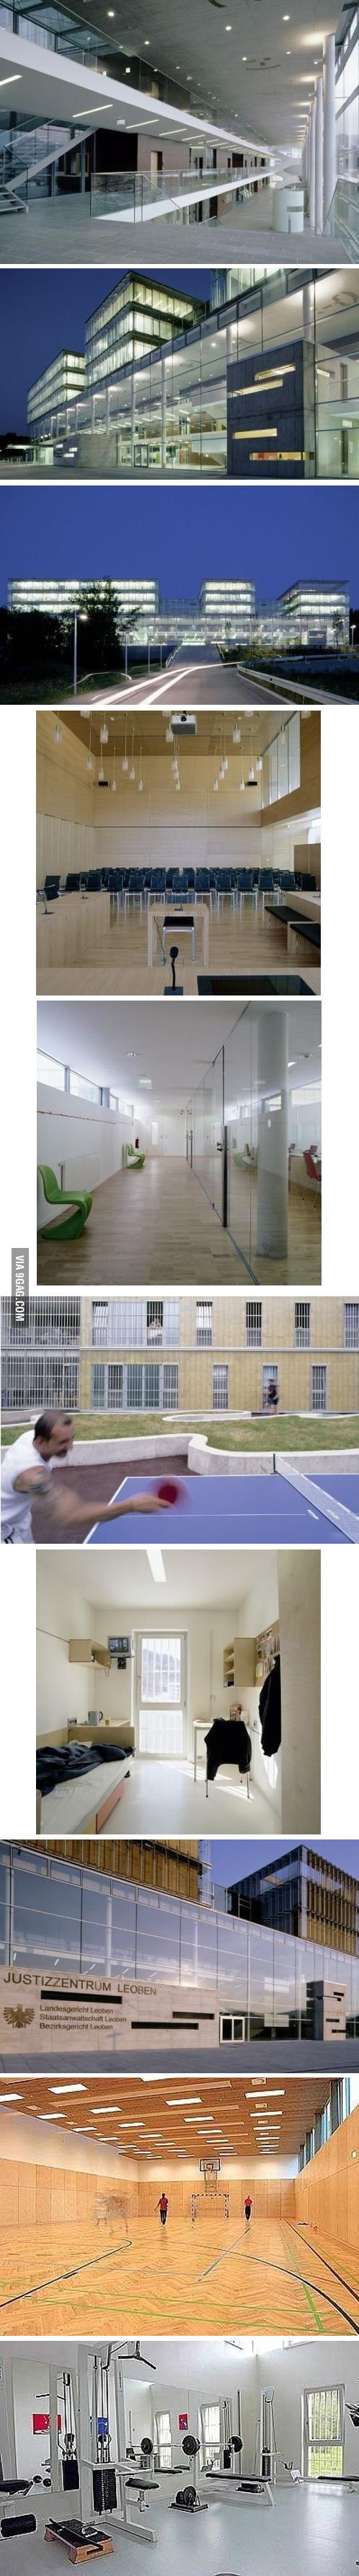 Just a prison in Leoben, Austria